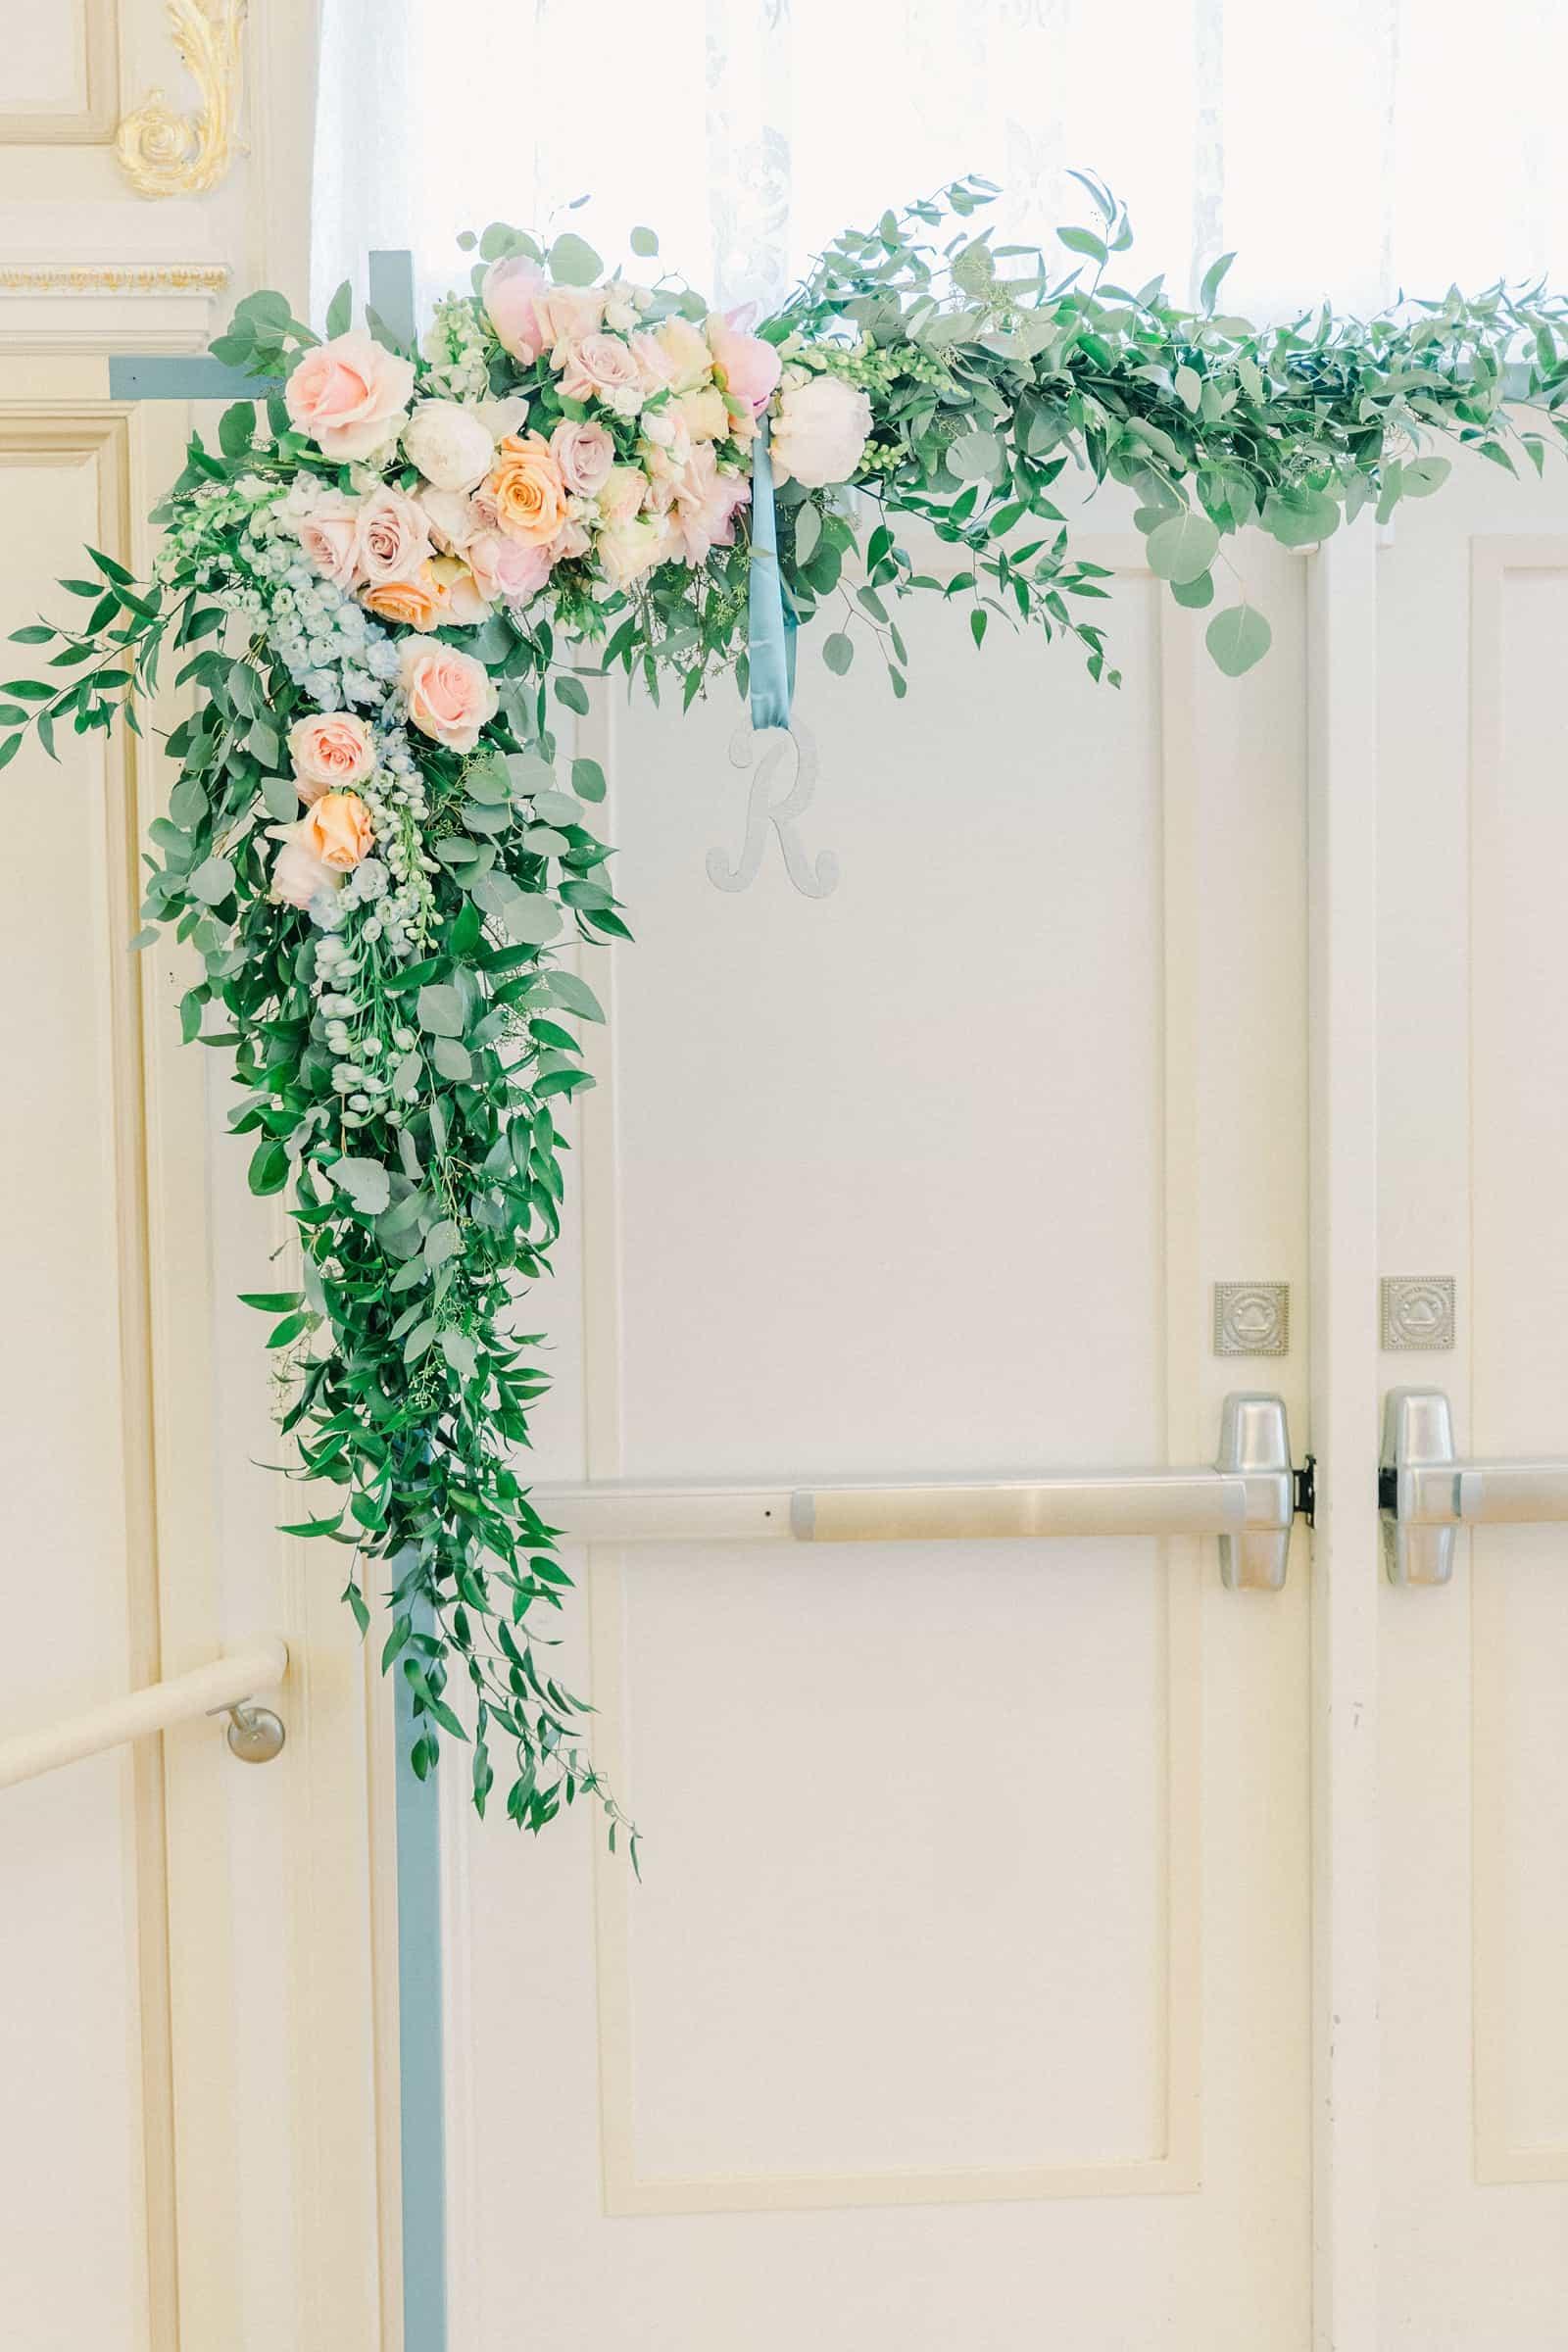 Thomas S. Monson Center Wedding, Salt Lake LDS Temple Wedding, Utah wedding photography, reception decor floral arch